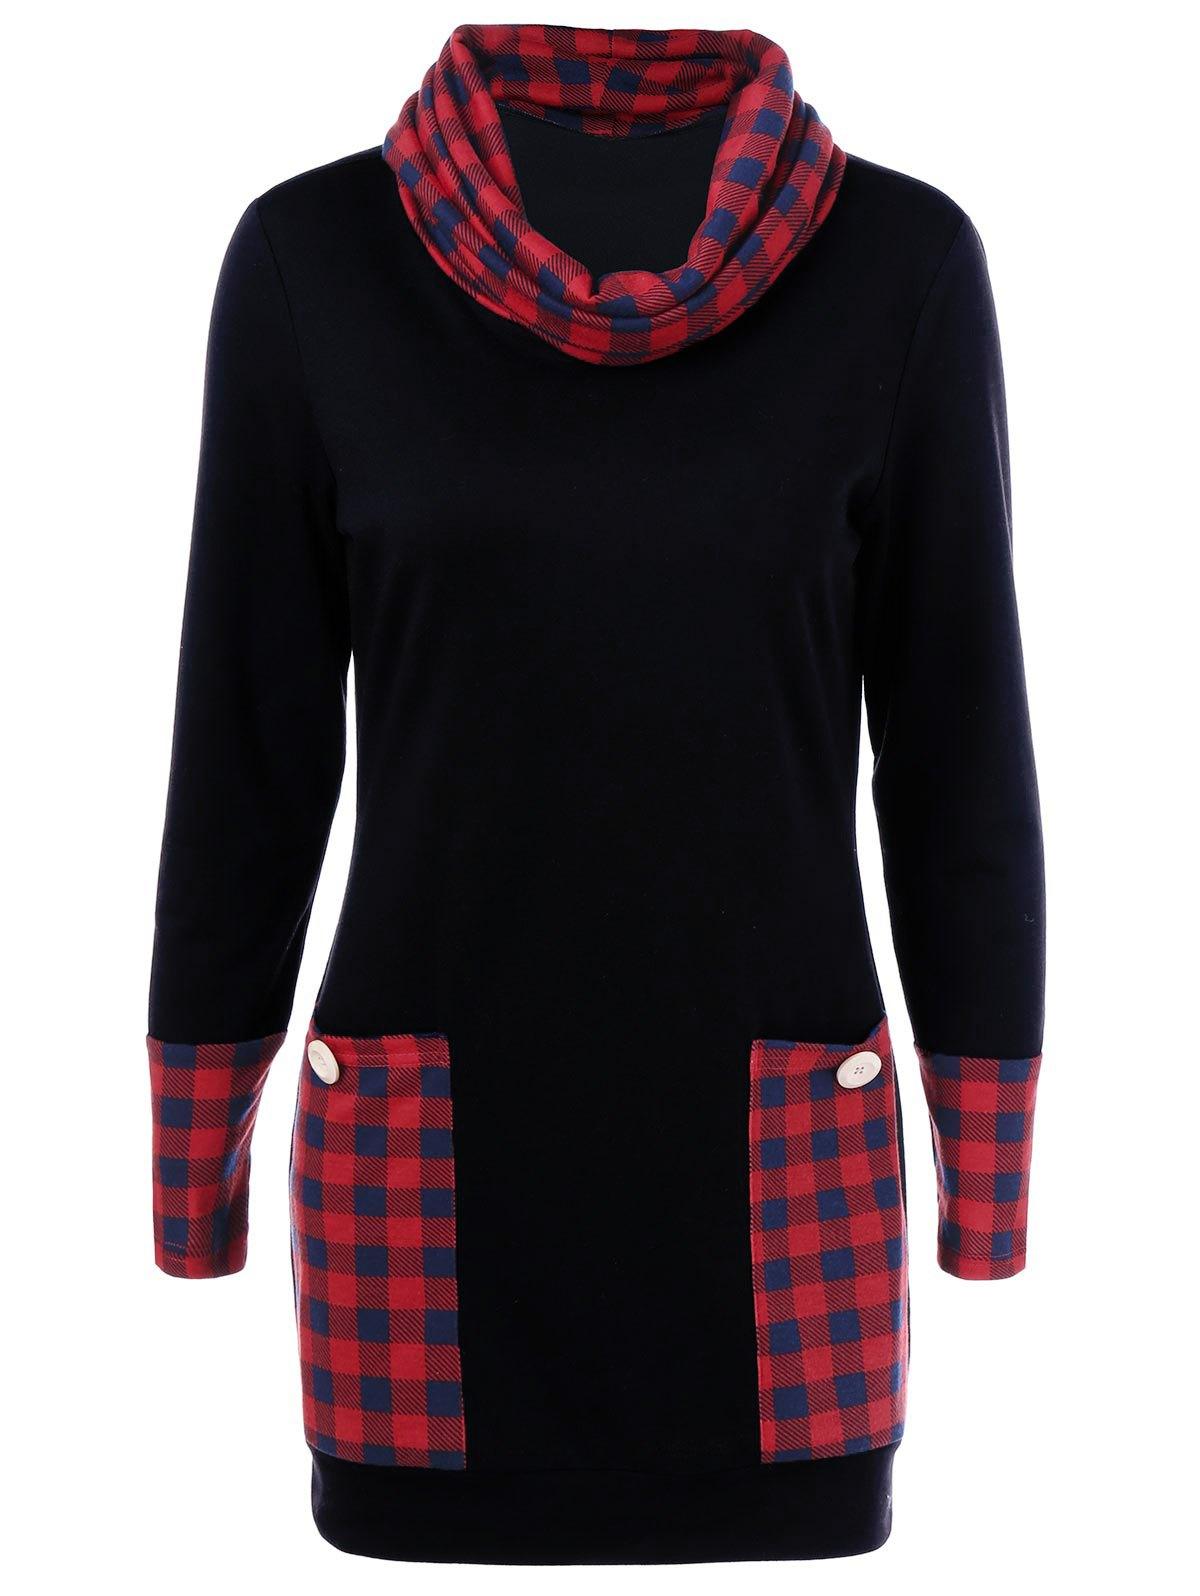 1200x1596 Plaid Trim Cowl Neck Dress